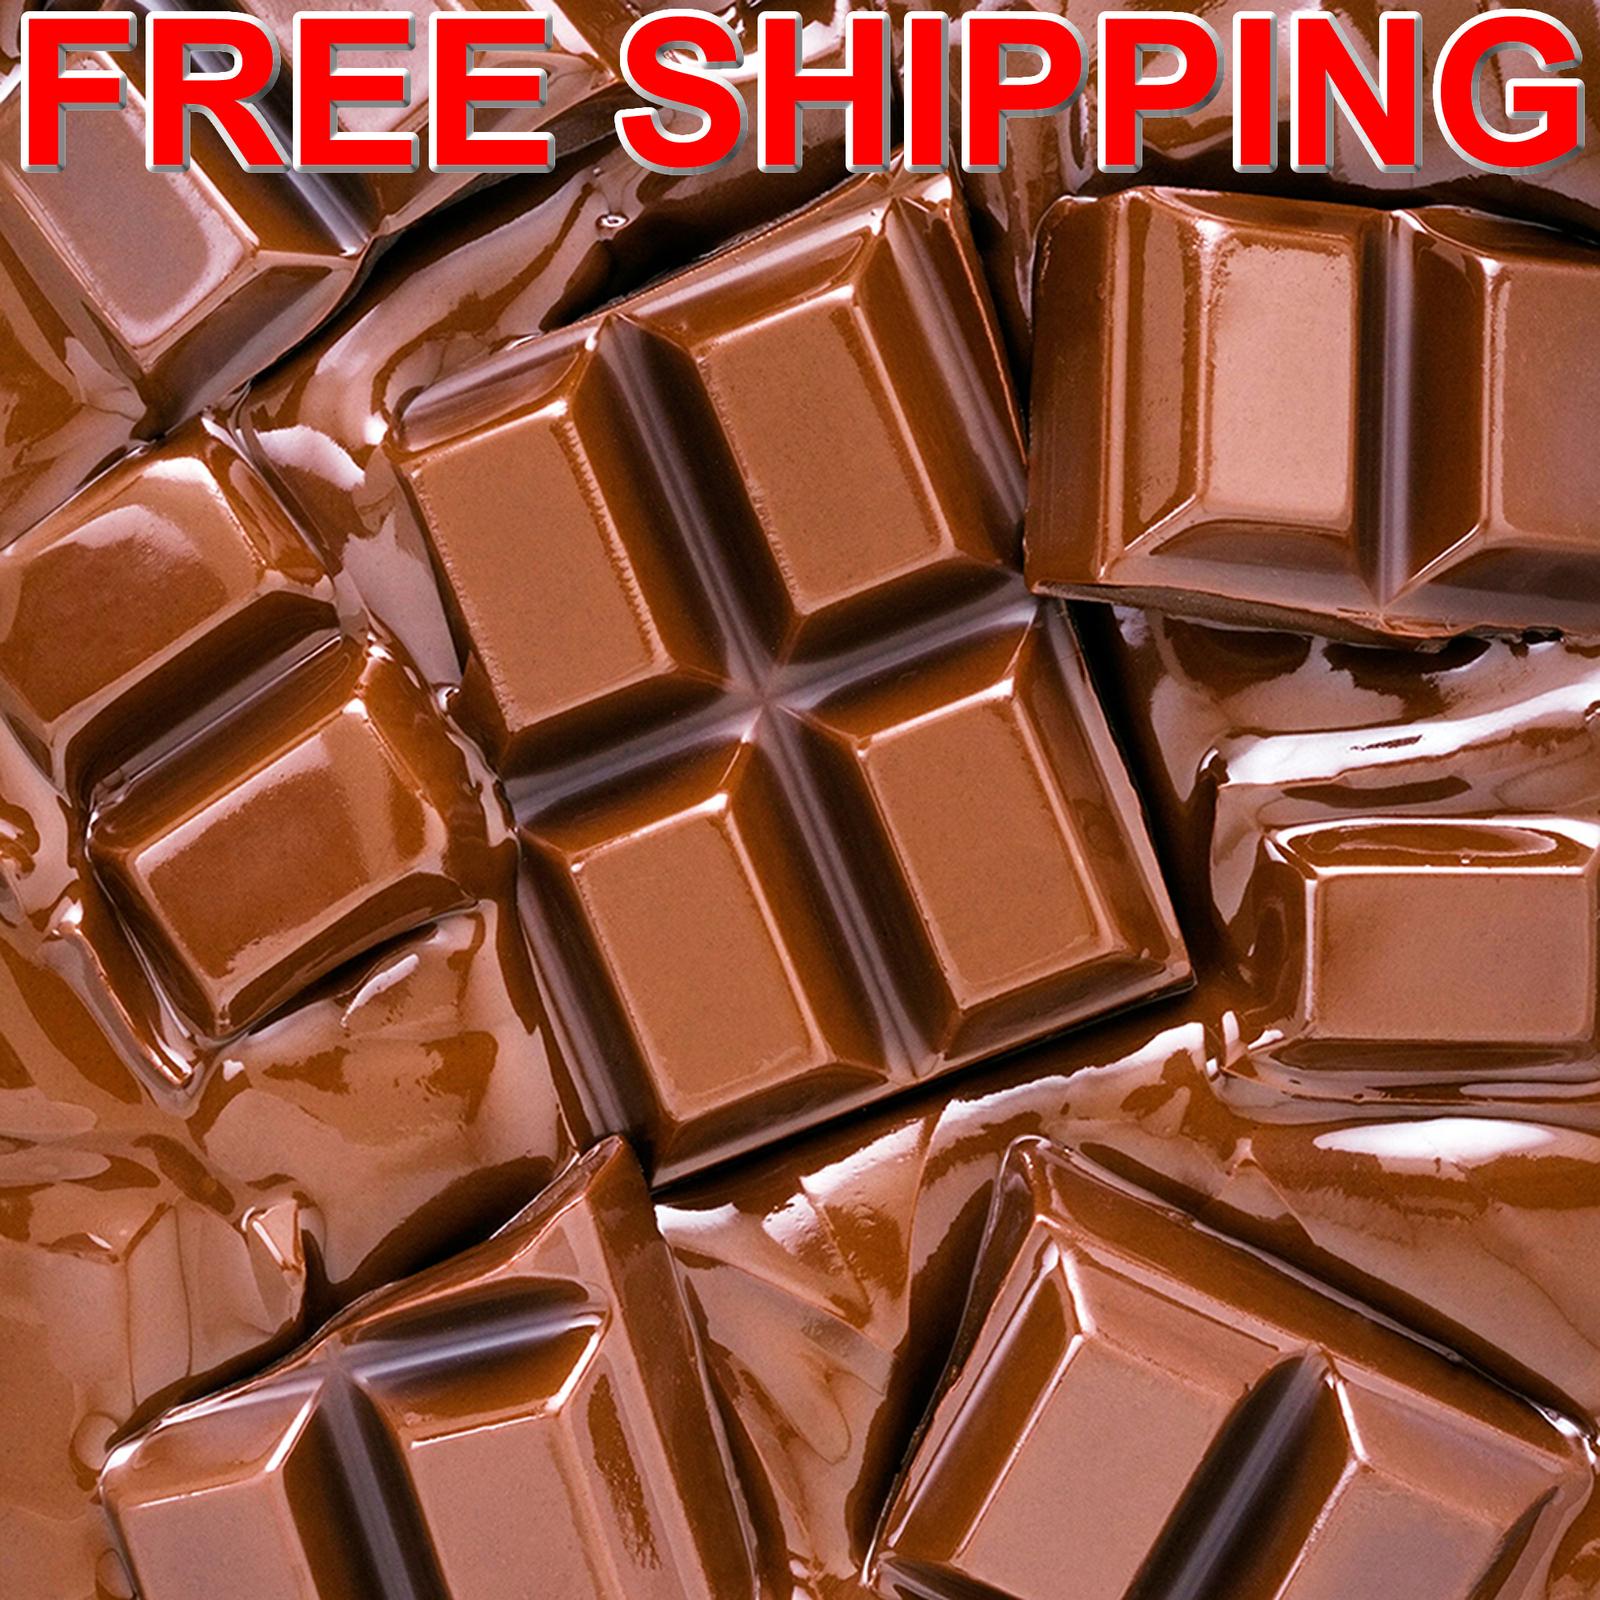 CHOCOLATE Roll On Fragrance Oil VEGAN & CRUELTY FREE